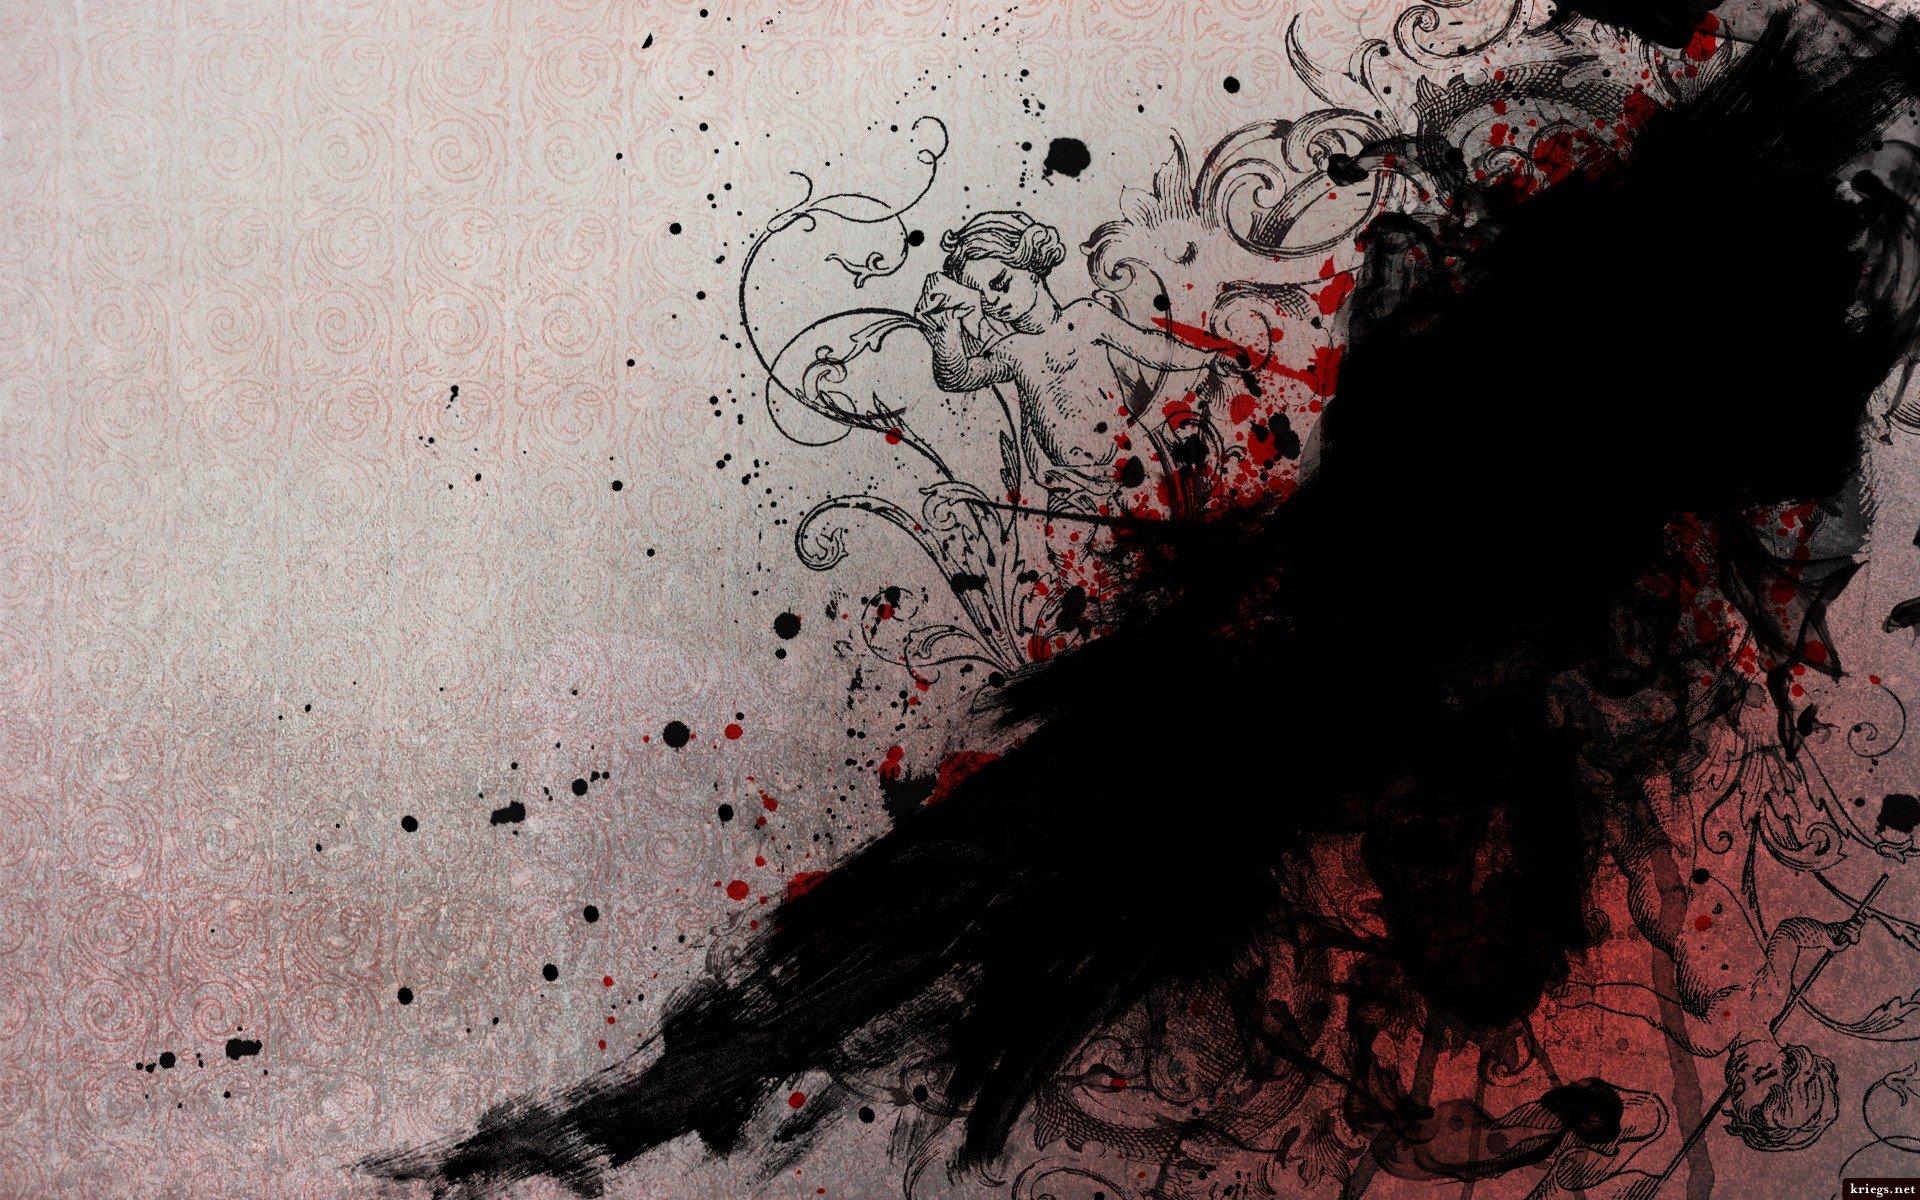 Grunge artwork paint splatter wallpaper 1920x1200 - Splatter paint desktop backgrounds ...